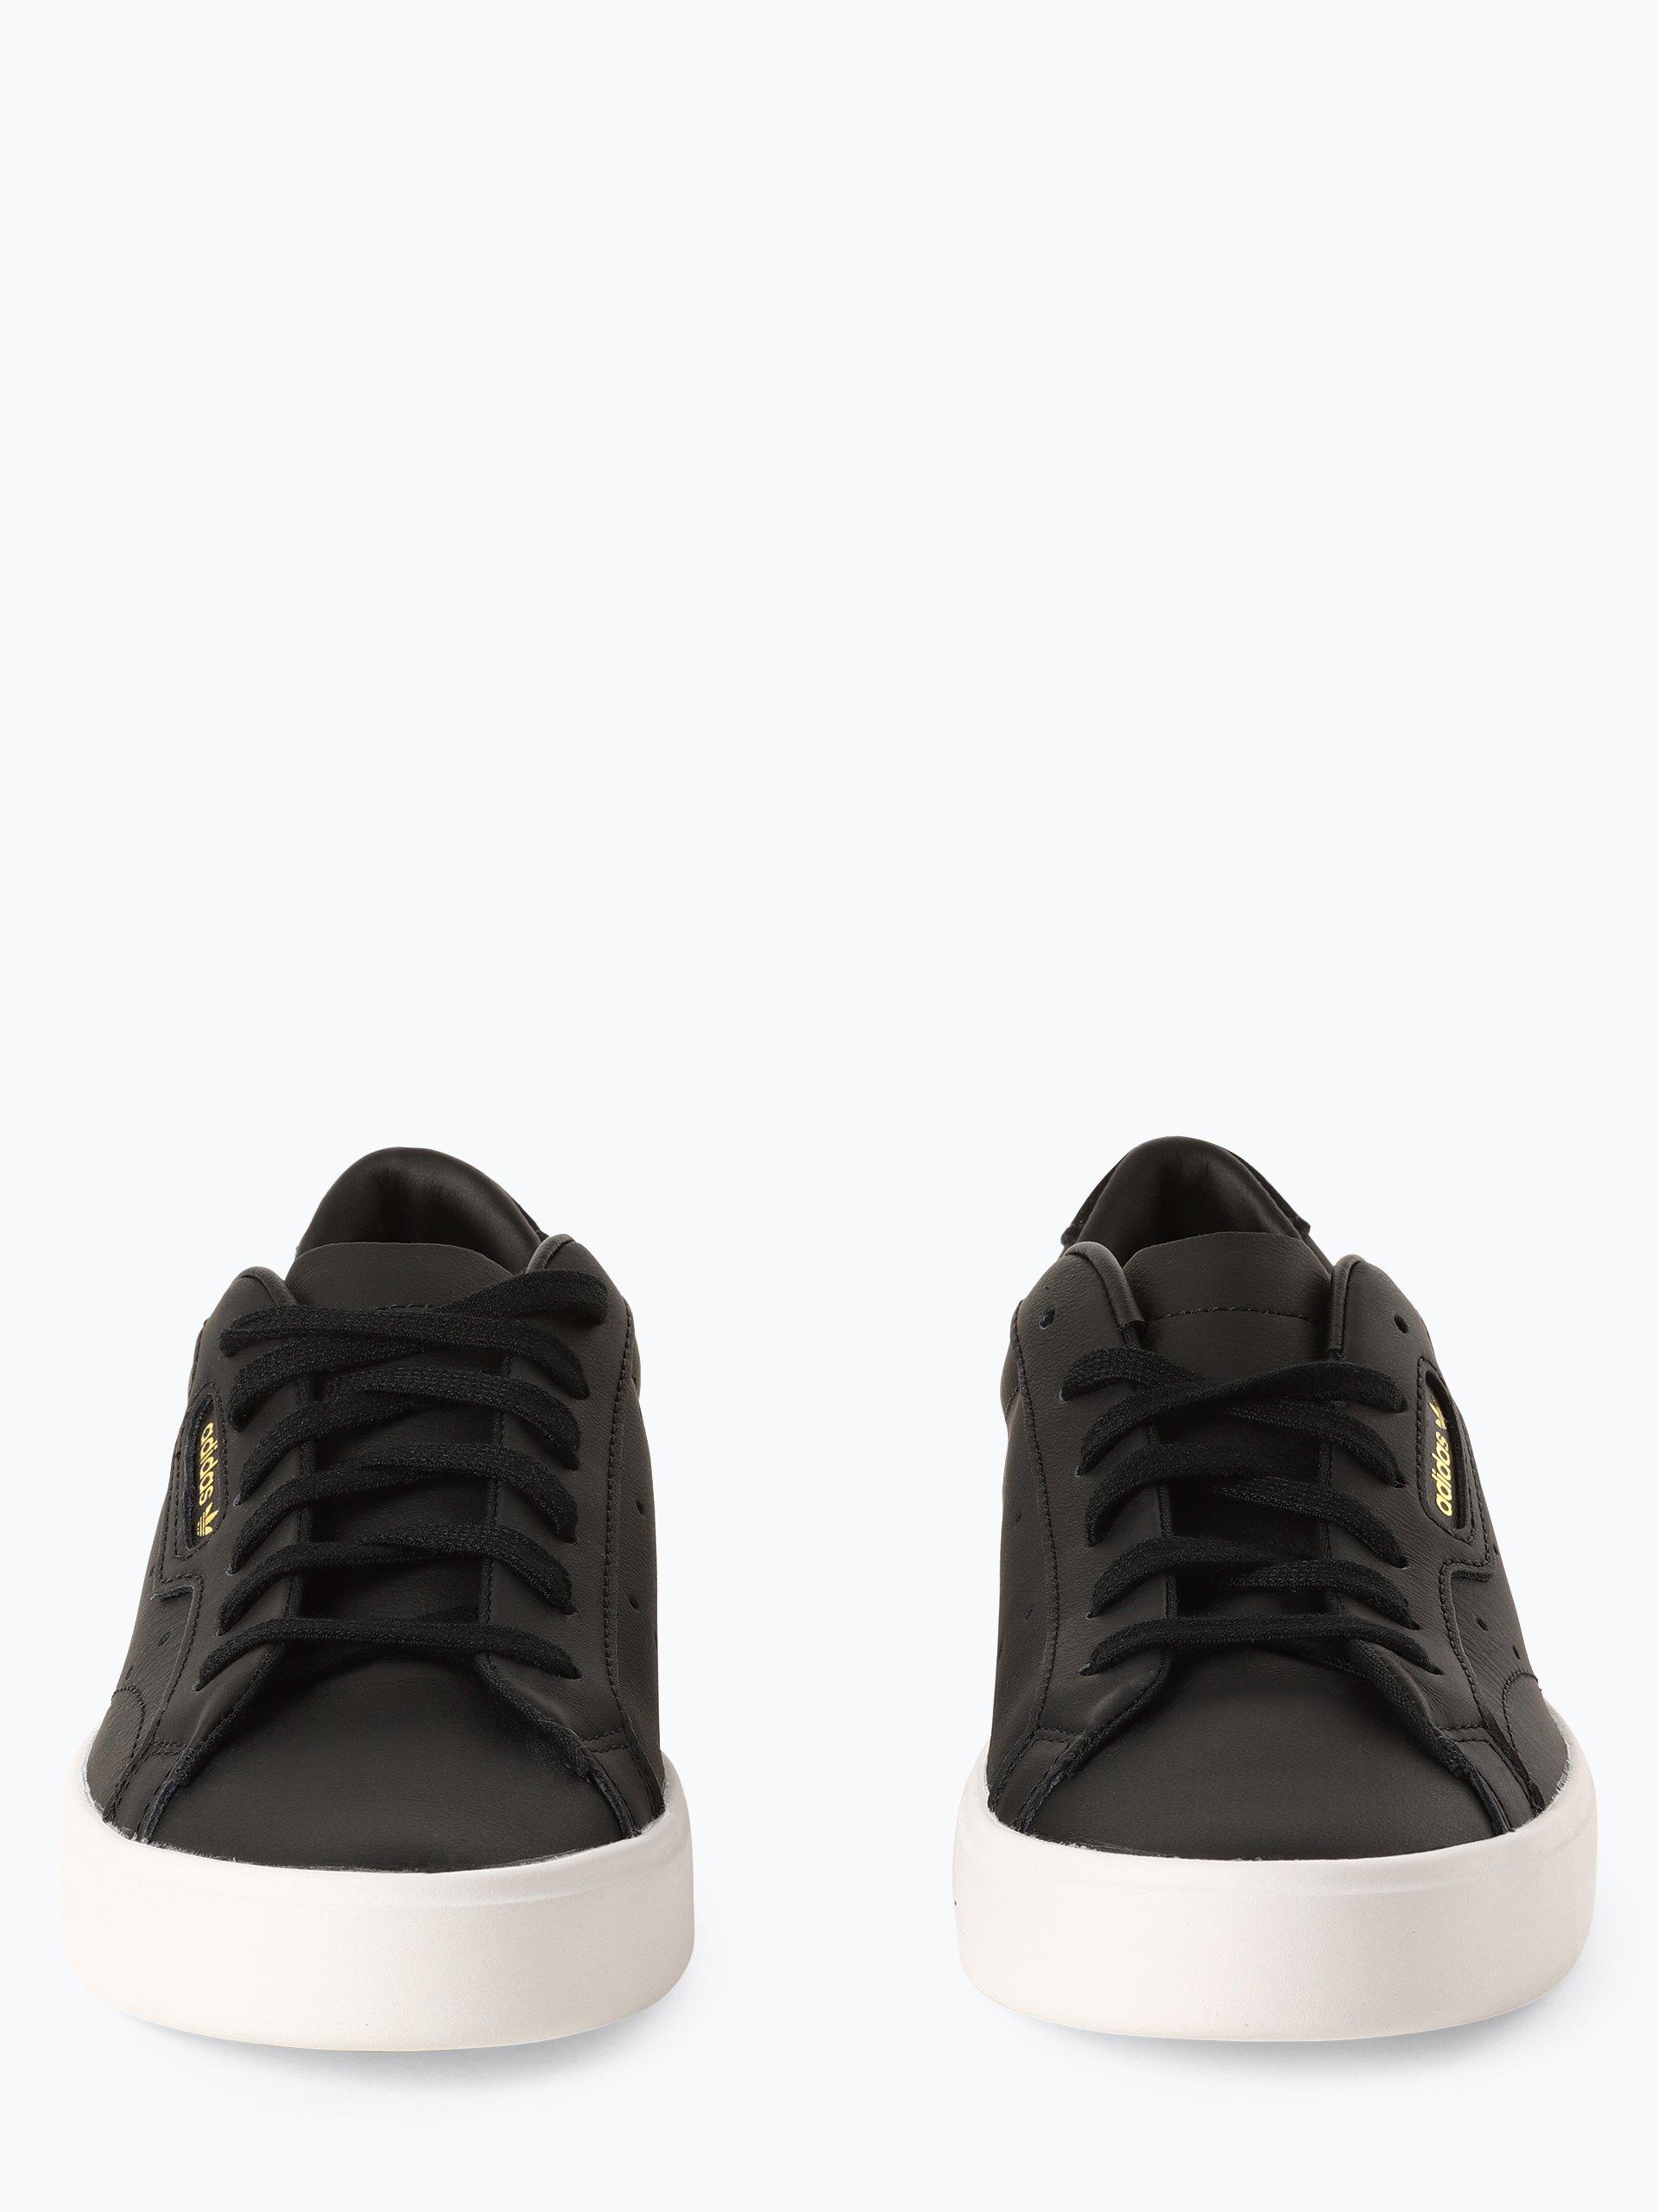 adidas Originals Damskie tenisówki ze skóry – Sleek W